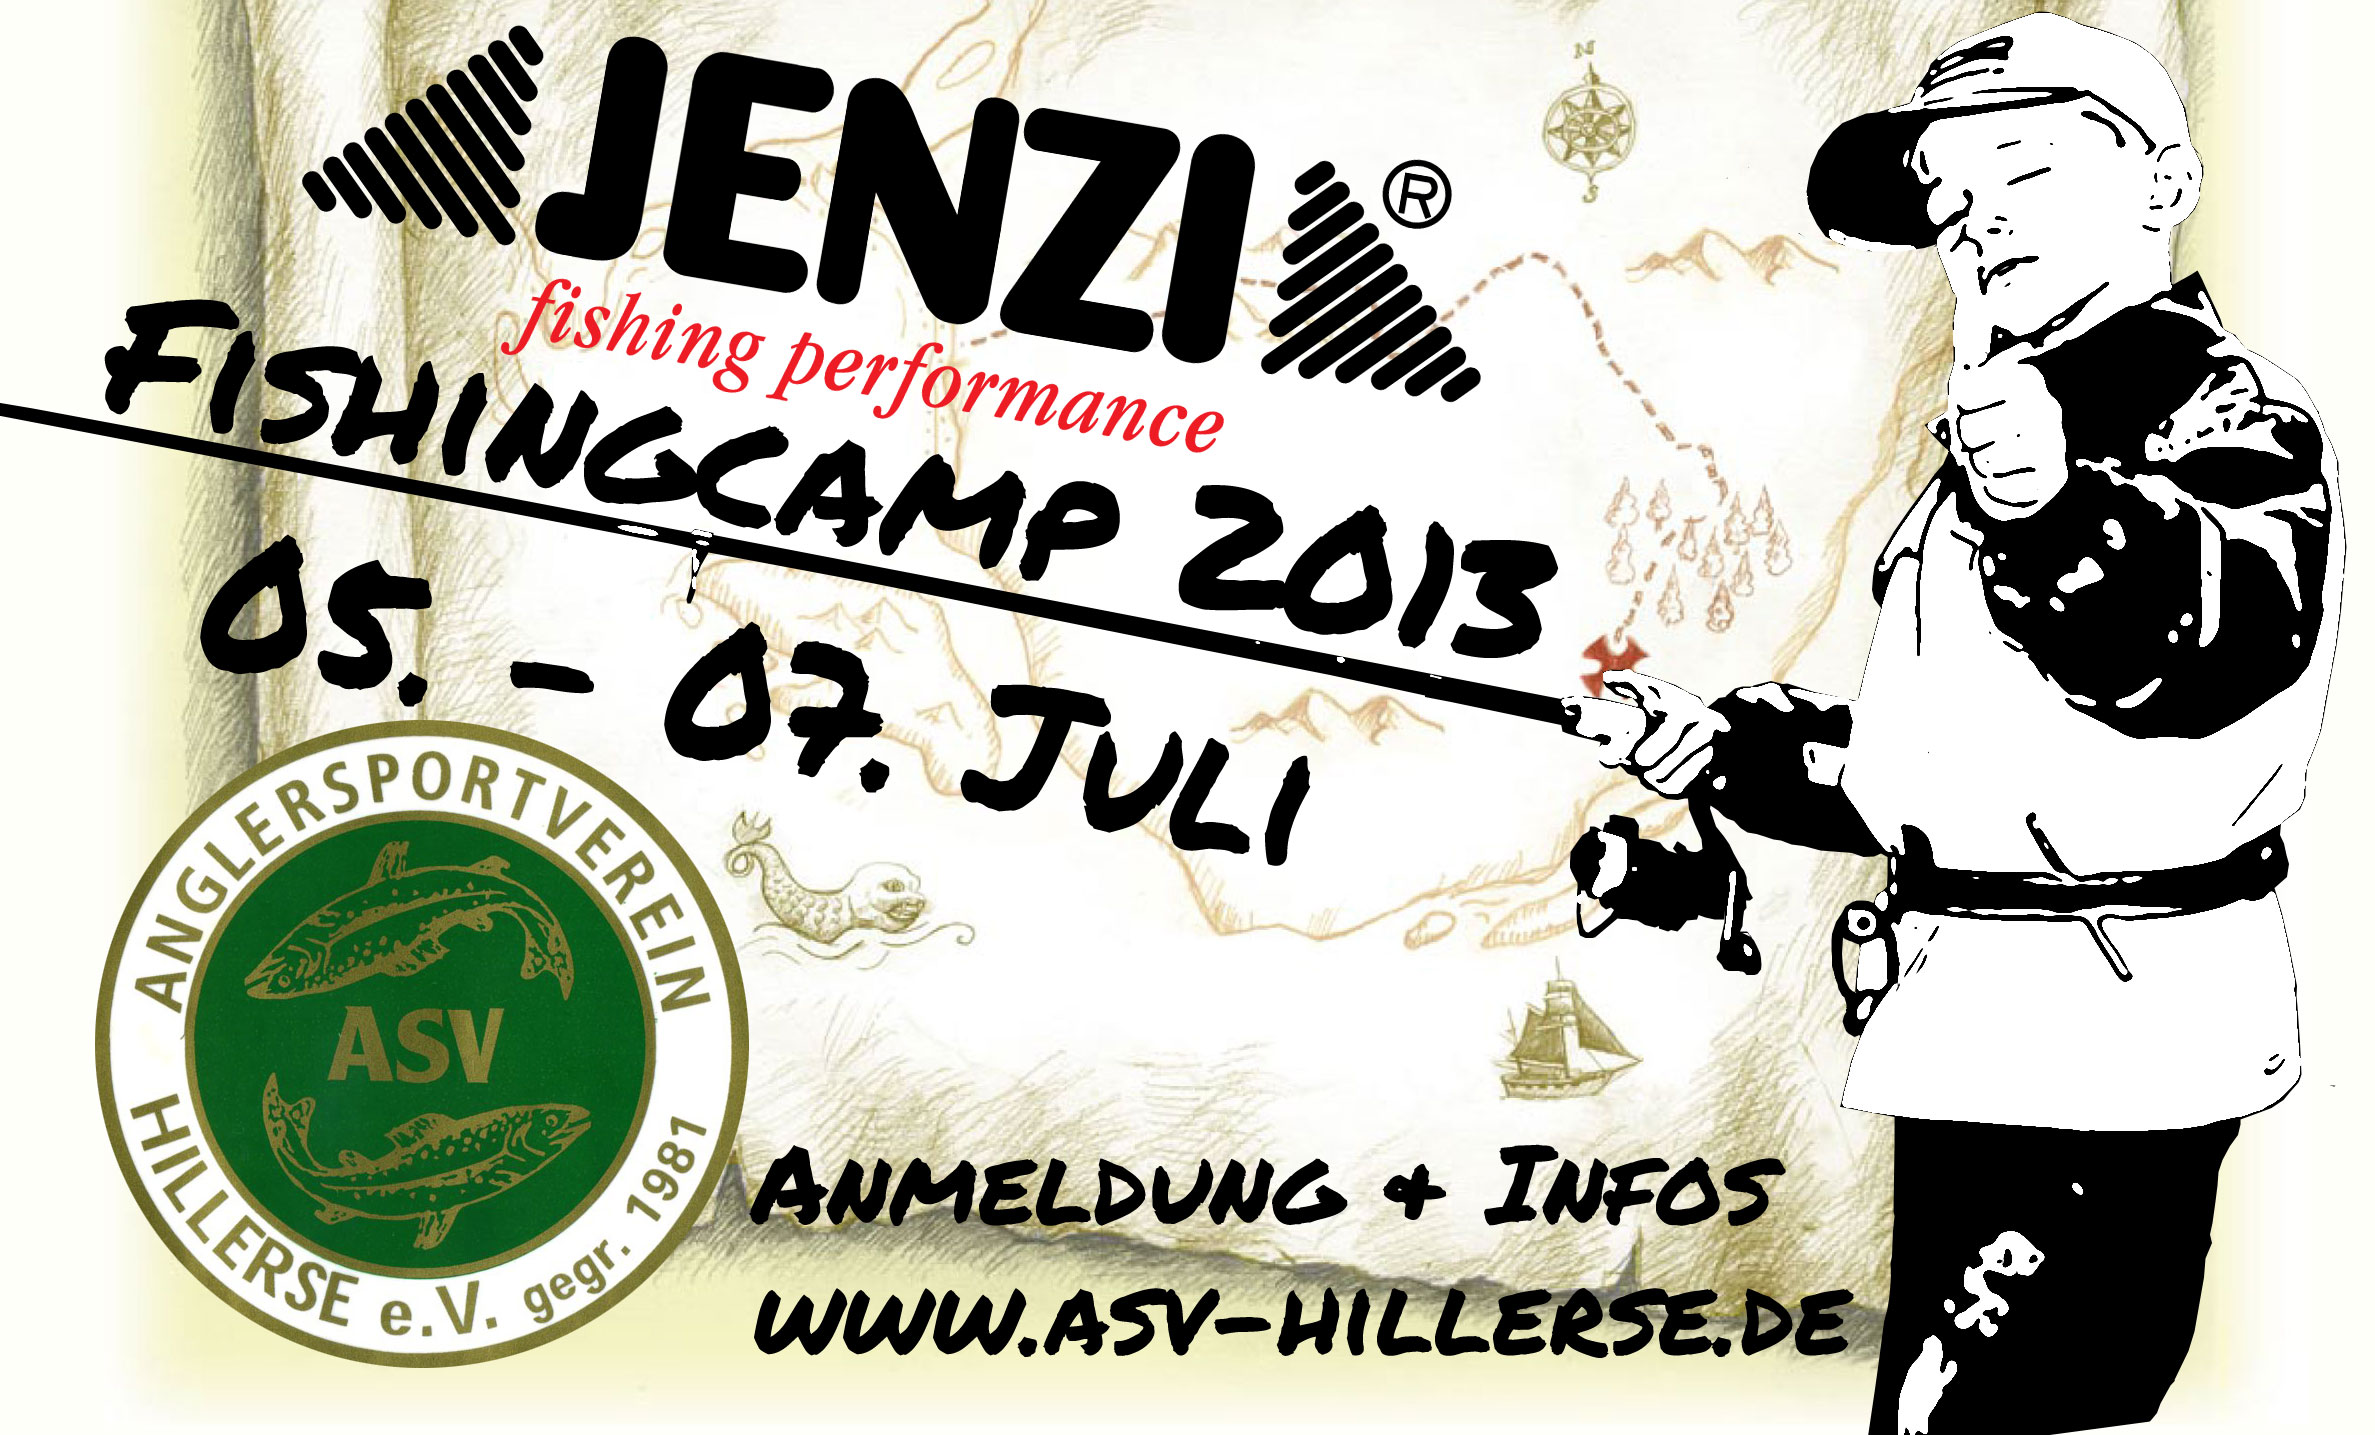 Wow: Jenzi-Jugendfishercamp 2013 in Kooperation mit dem ASV Hillerse!